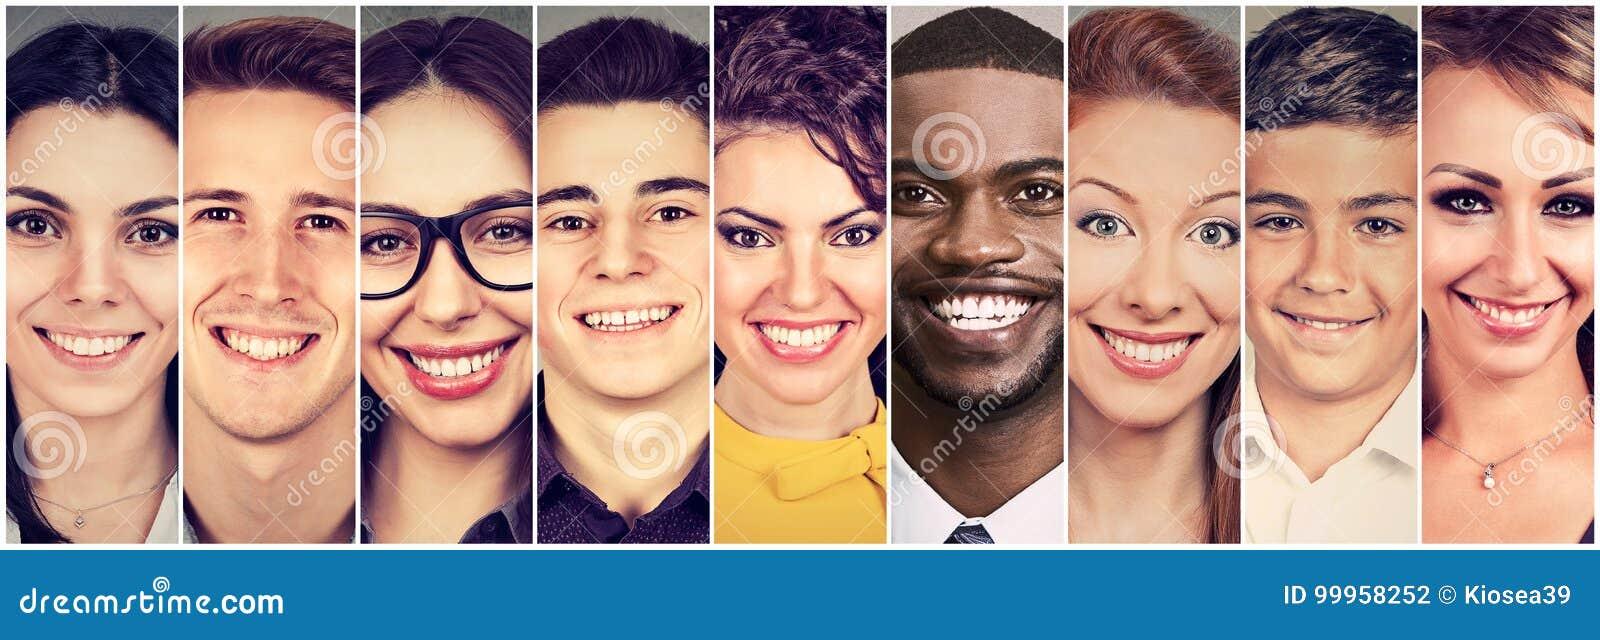 Faces de sorriso Grupo feliz de jovens